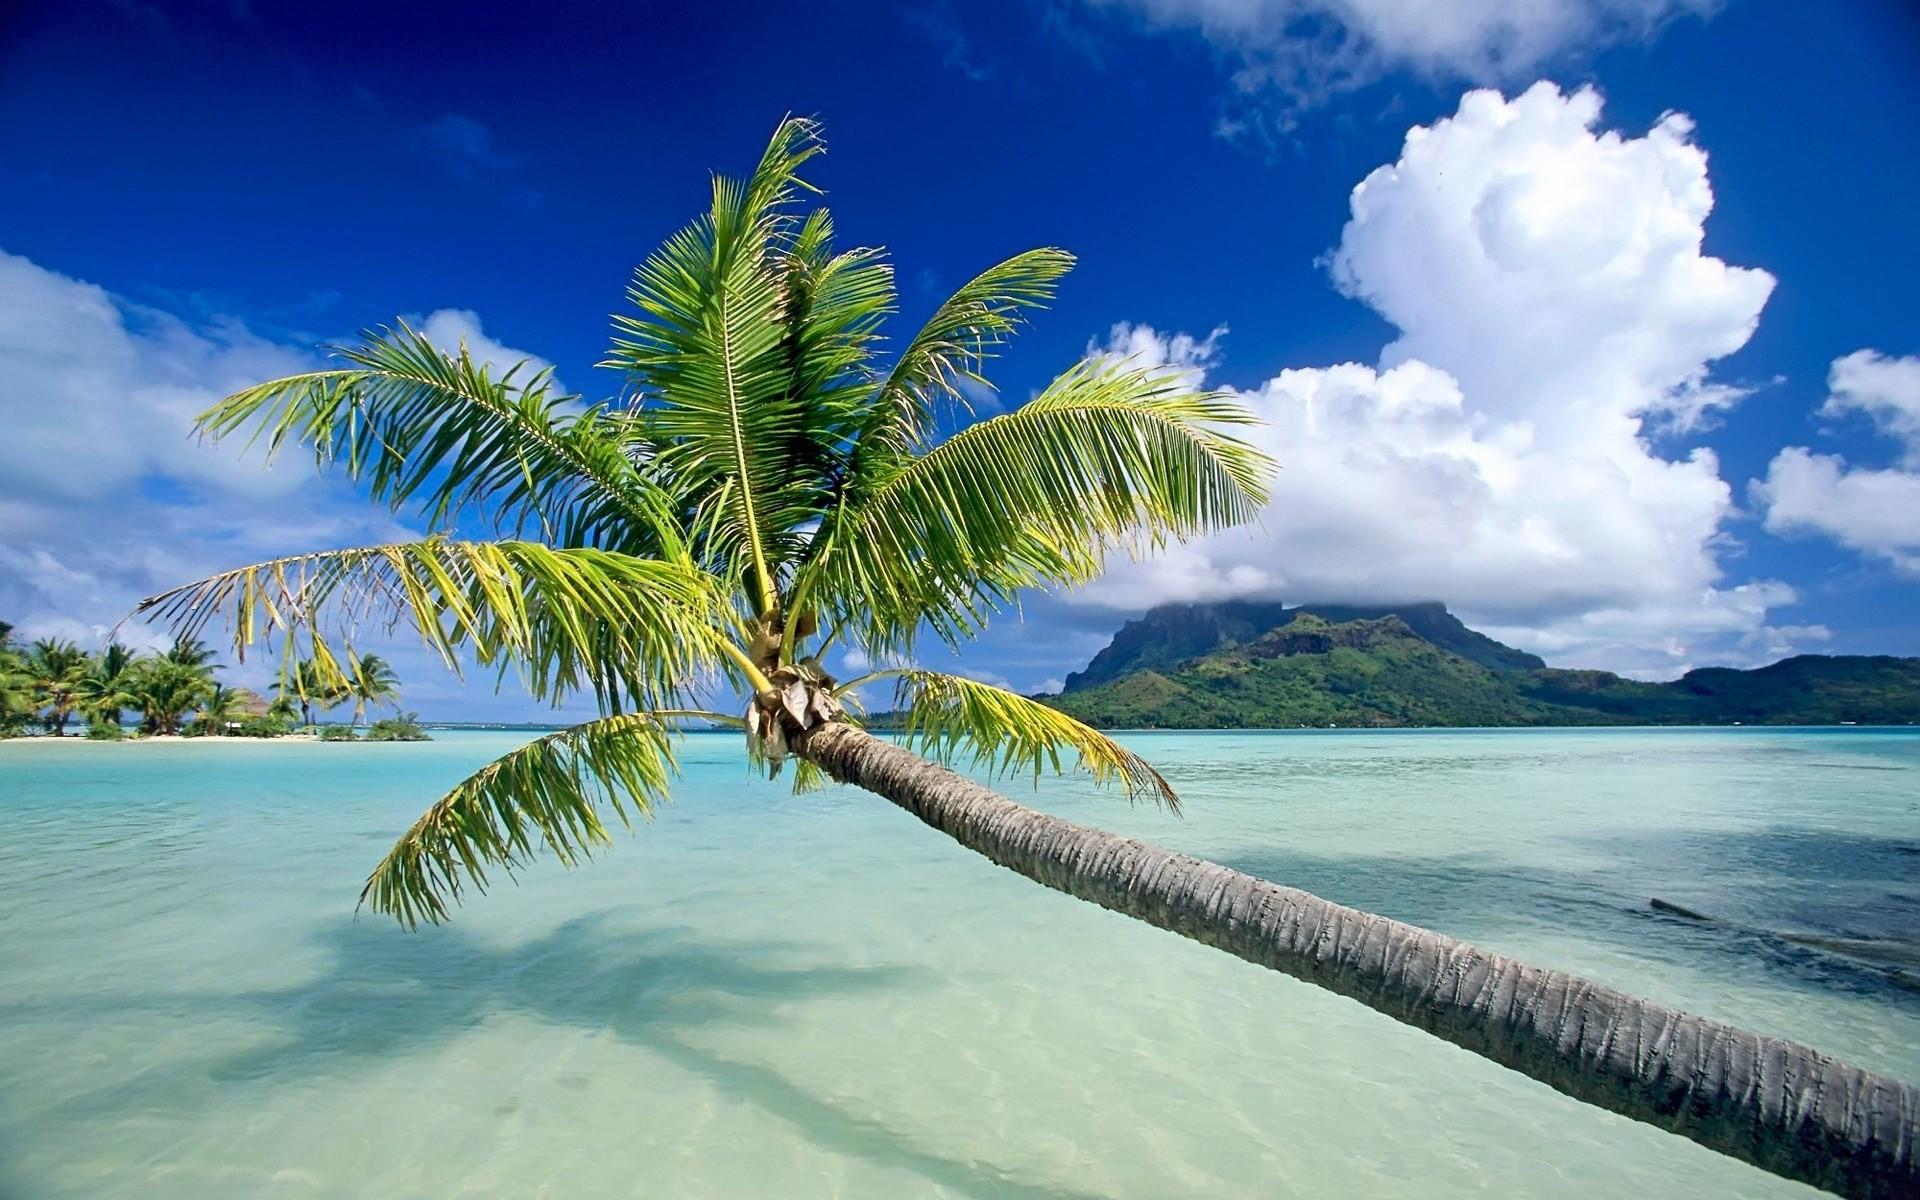 HD Widescreen palm tree wallpaper, 497 kB – Javon Brian